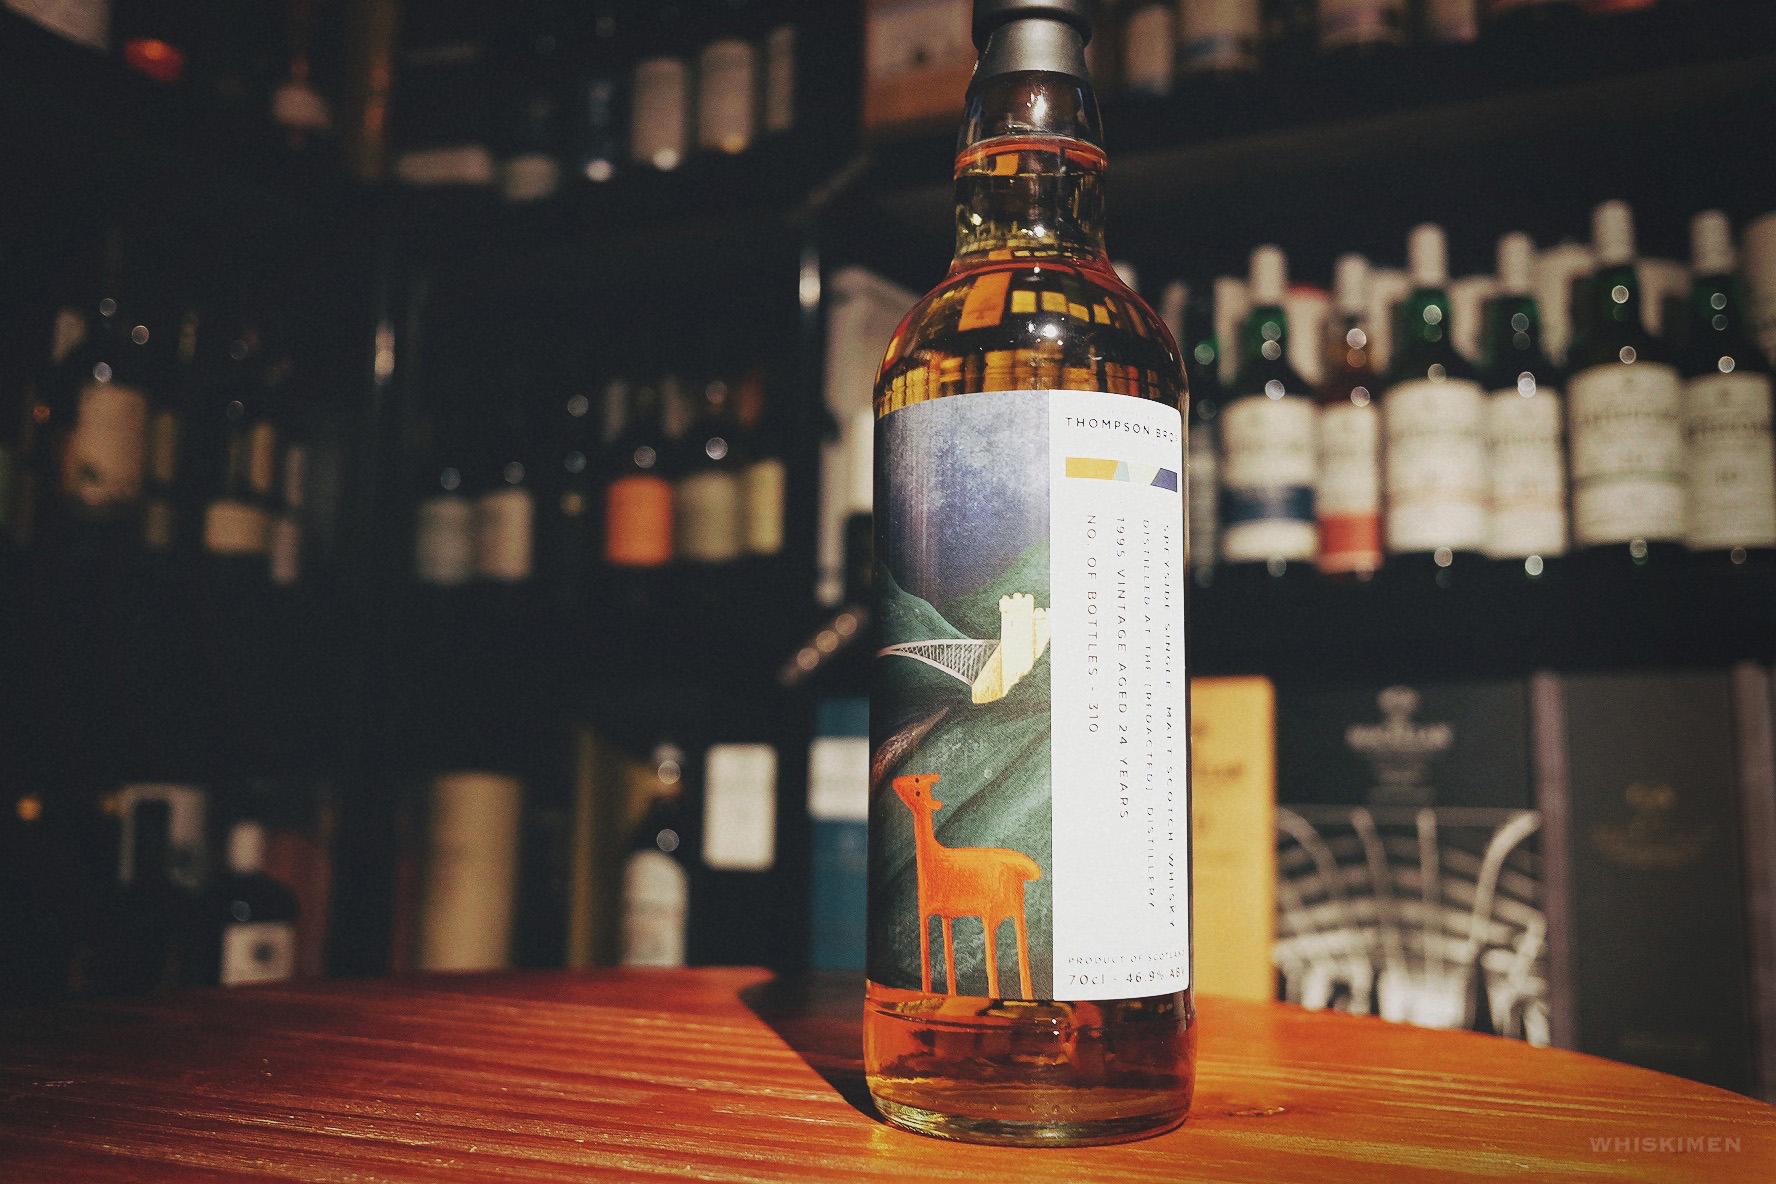 Phil & Simon Thompson Dornoch 1995 macallan Dornoch Castle Whisky Bar North of Scotland speyside independent bottler reacted American Oak reacted